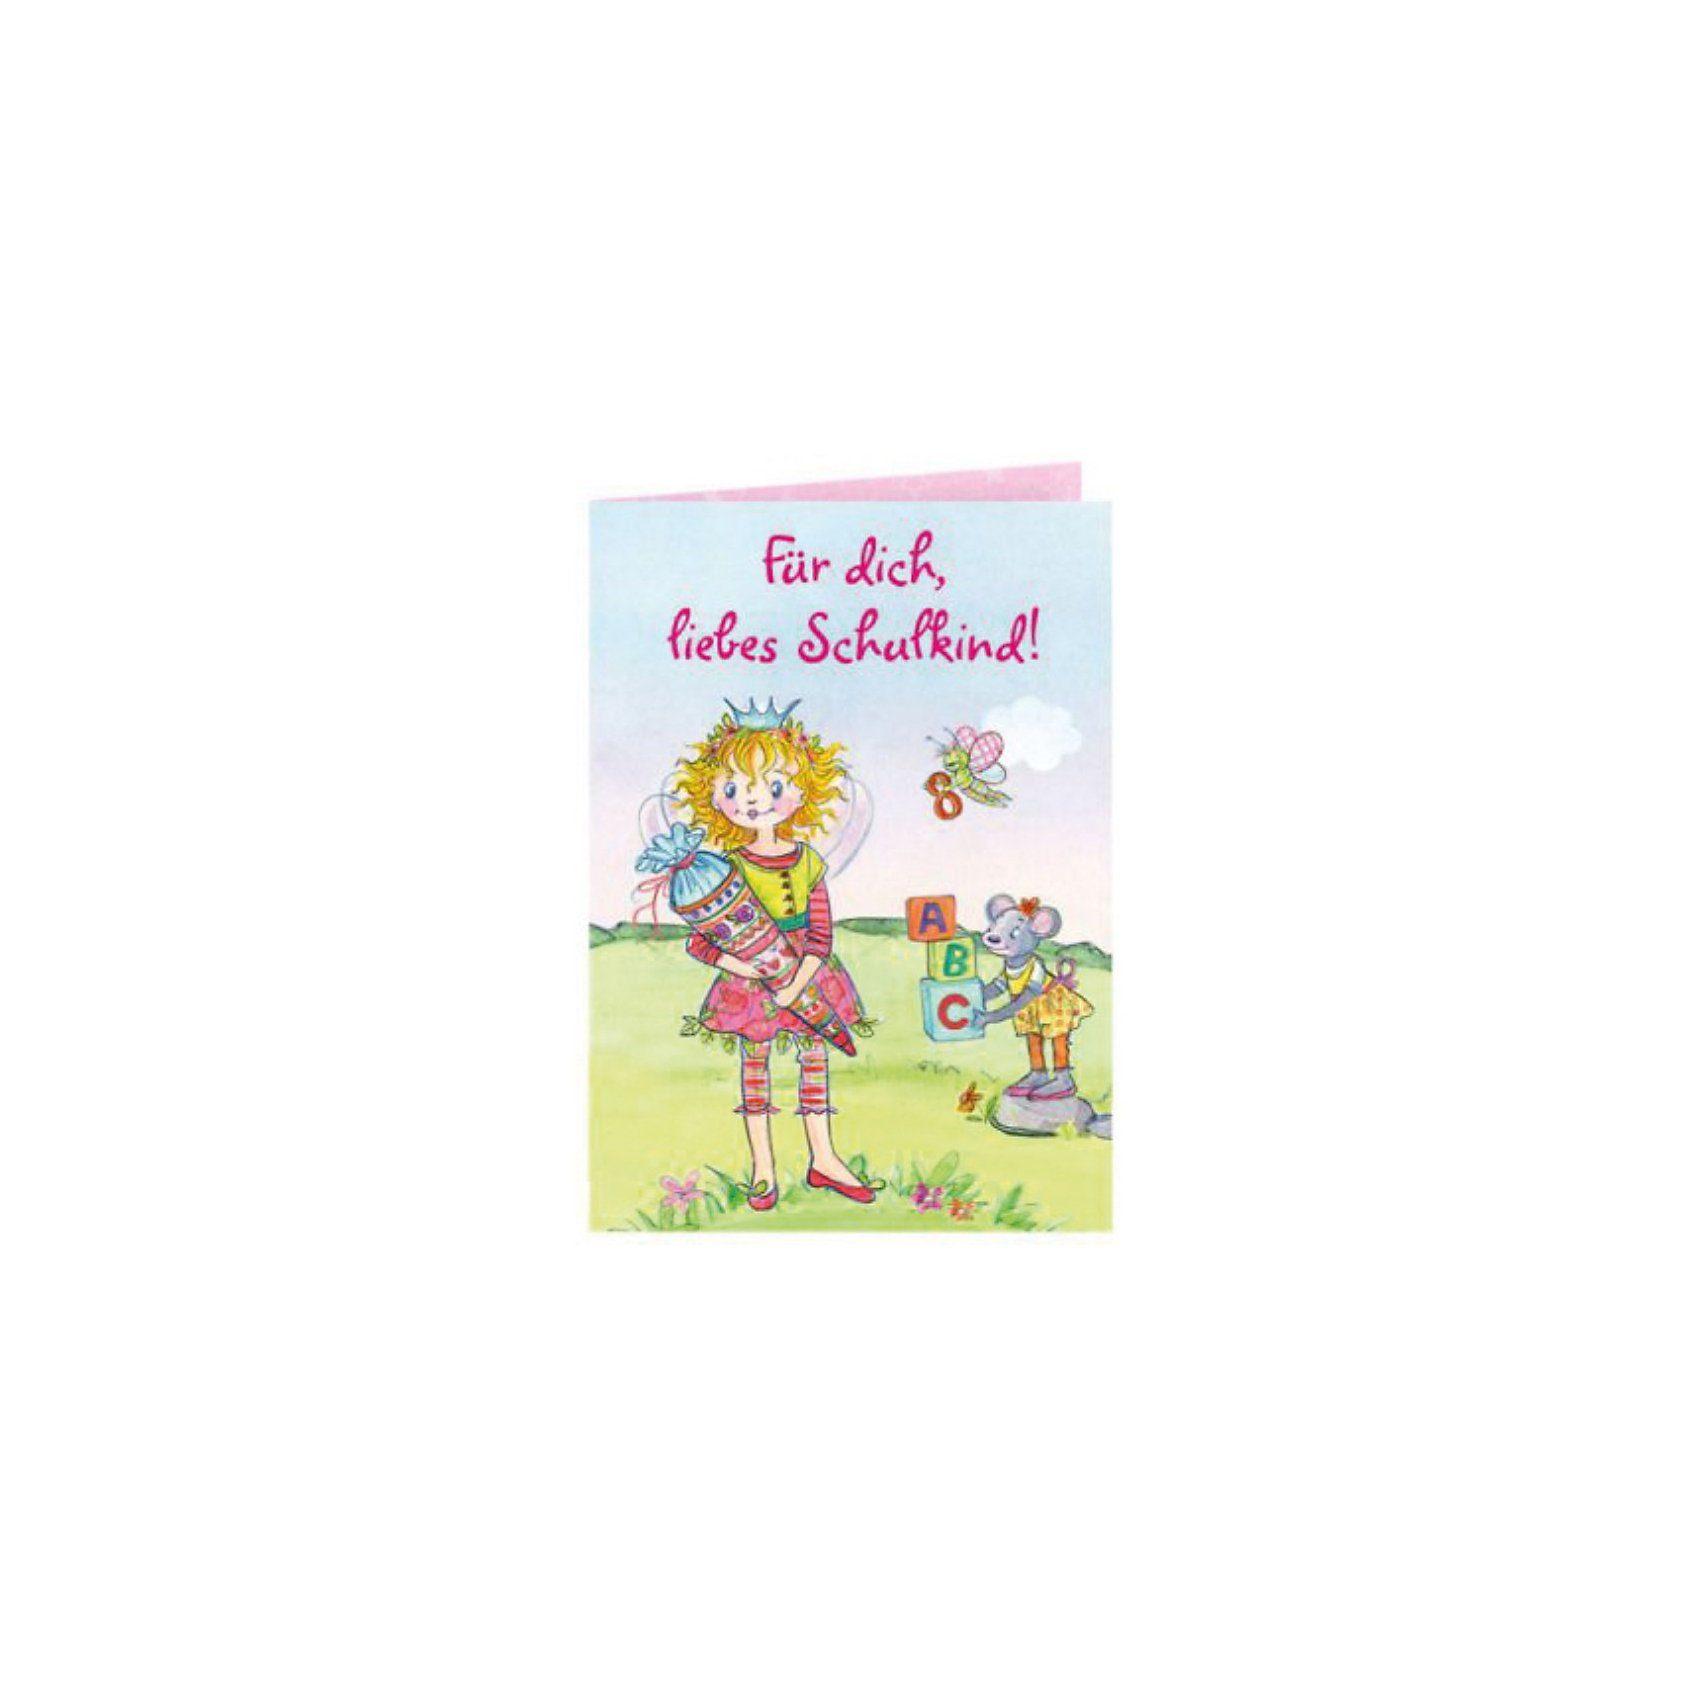 Coppenrath Mini-Schultüte: Alles Liebe zum Schulanfang! Prinzessin Lill